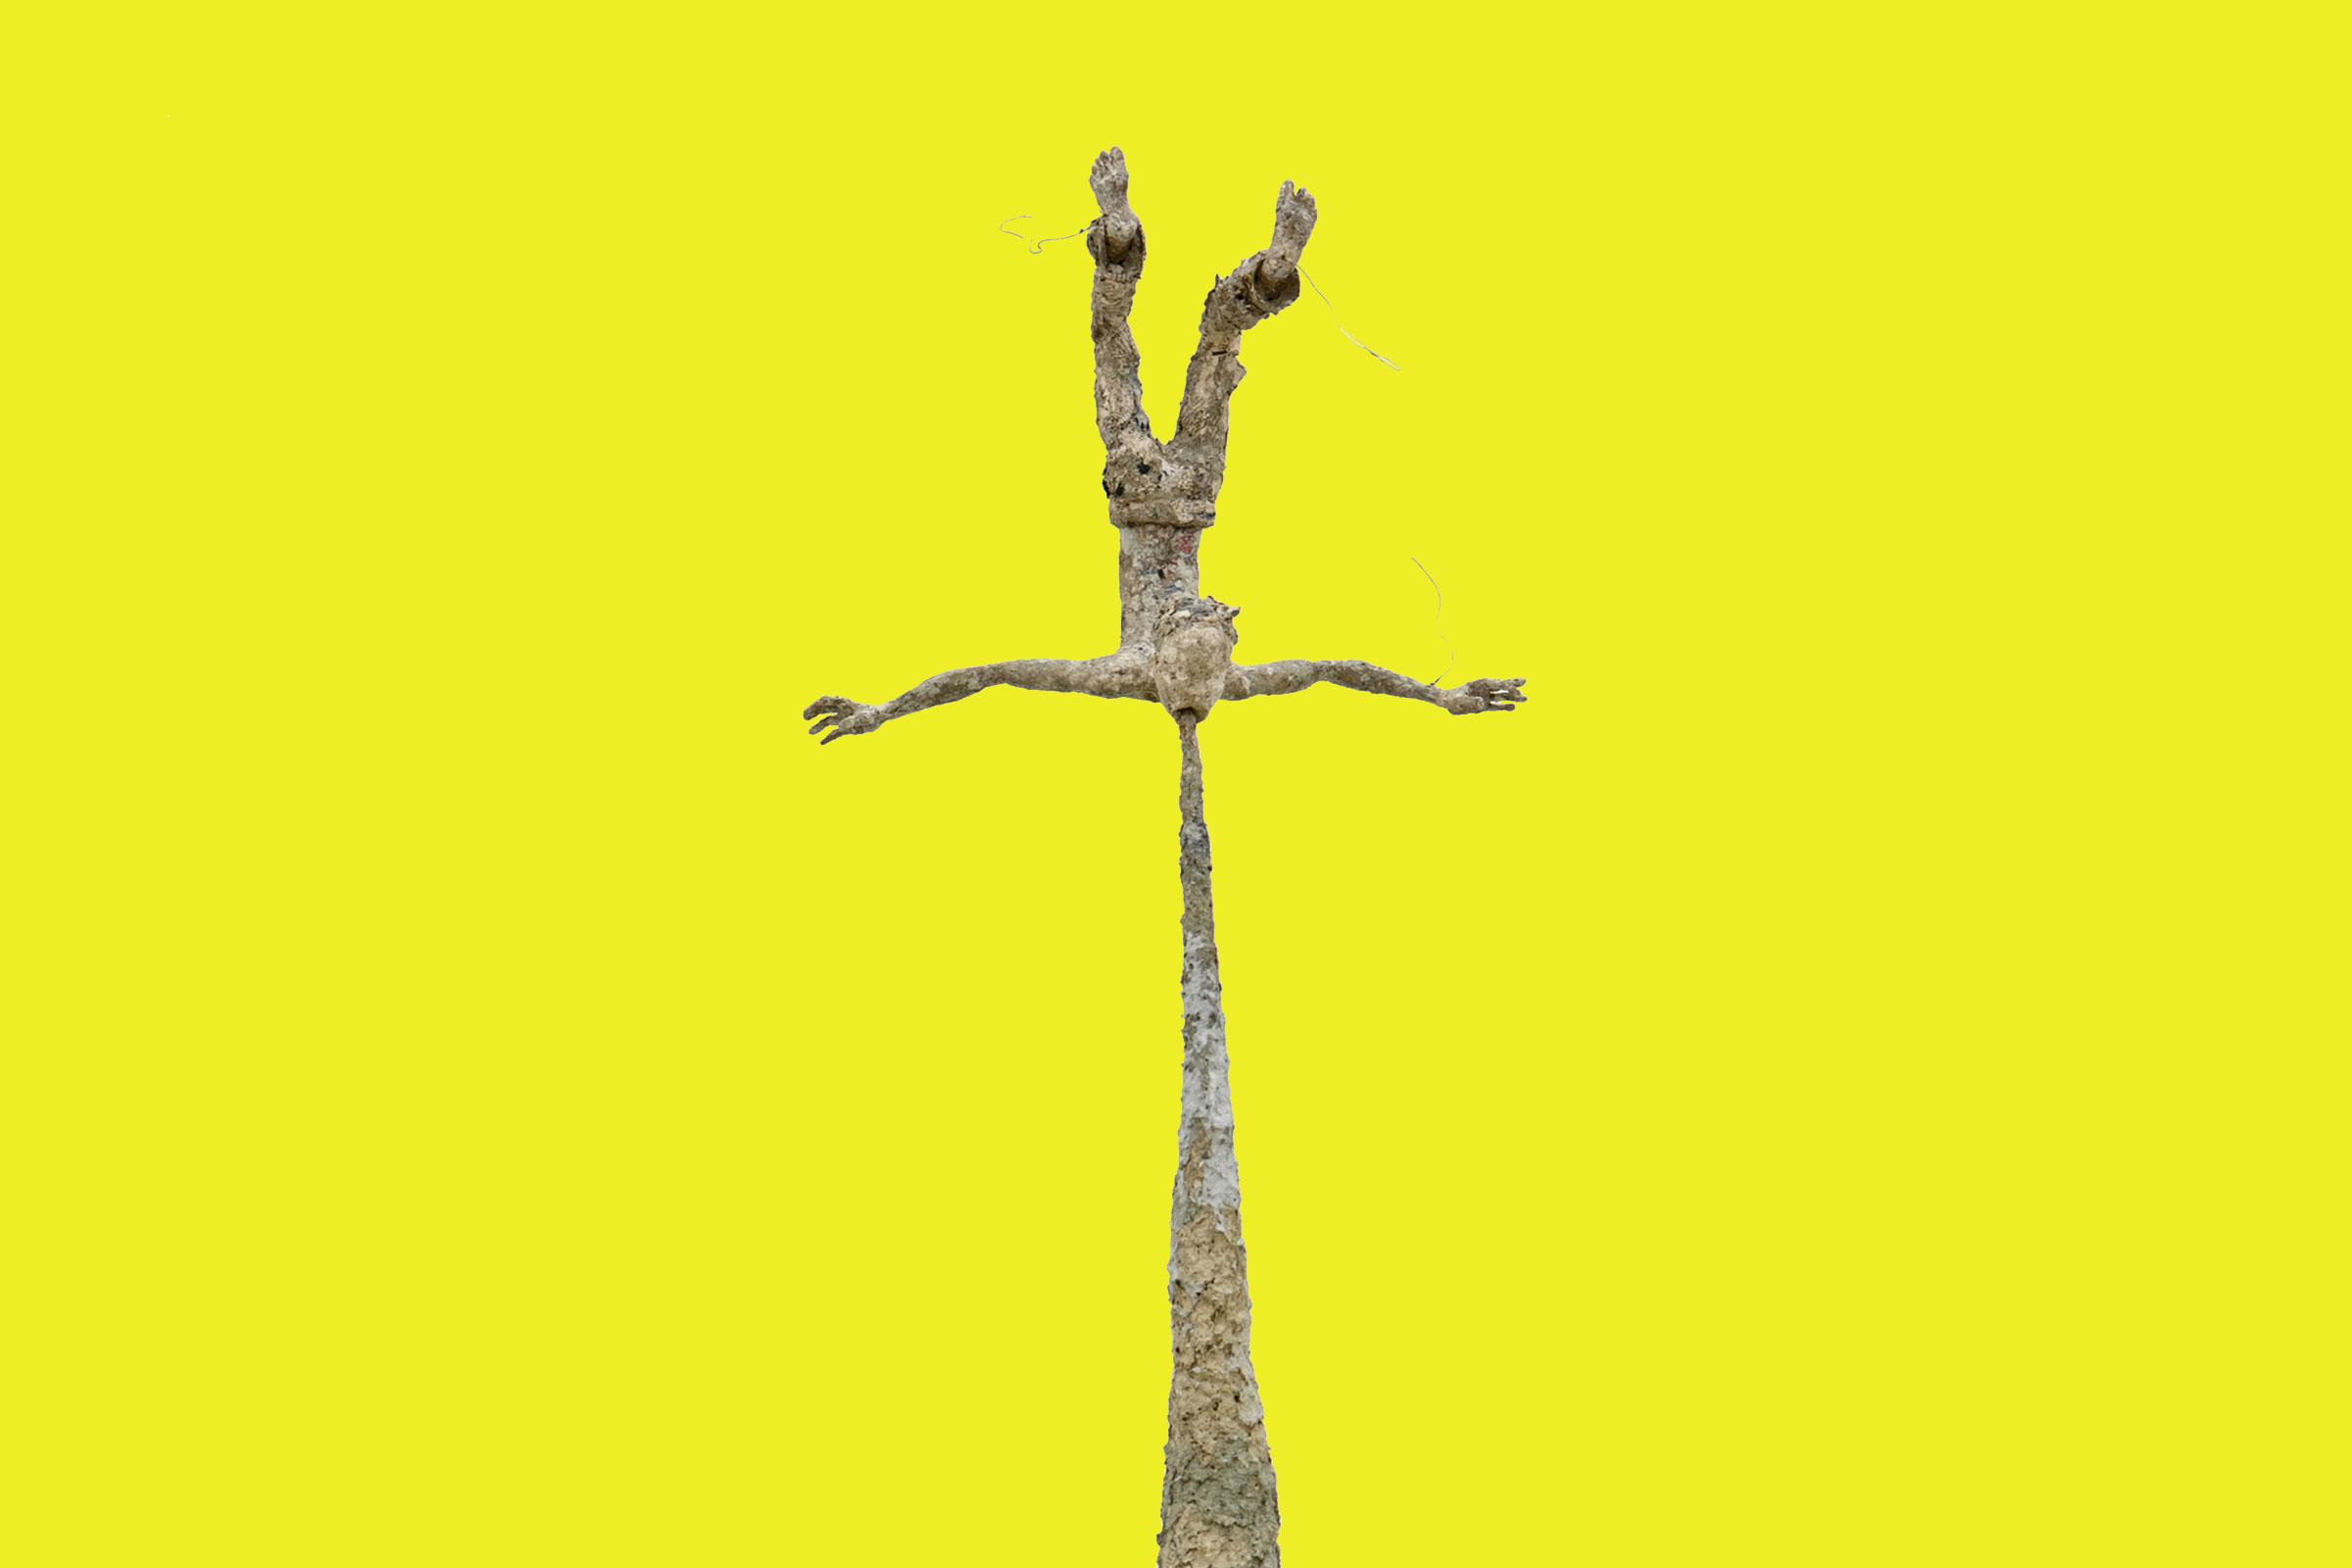 Michael Kalmbach –Kotzender –2008, Pappiermachee Draht, 218x55x45cm –galerie metzger contemporary art aschaffenburg gallery